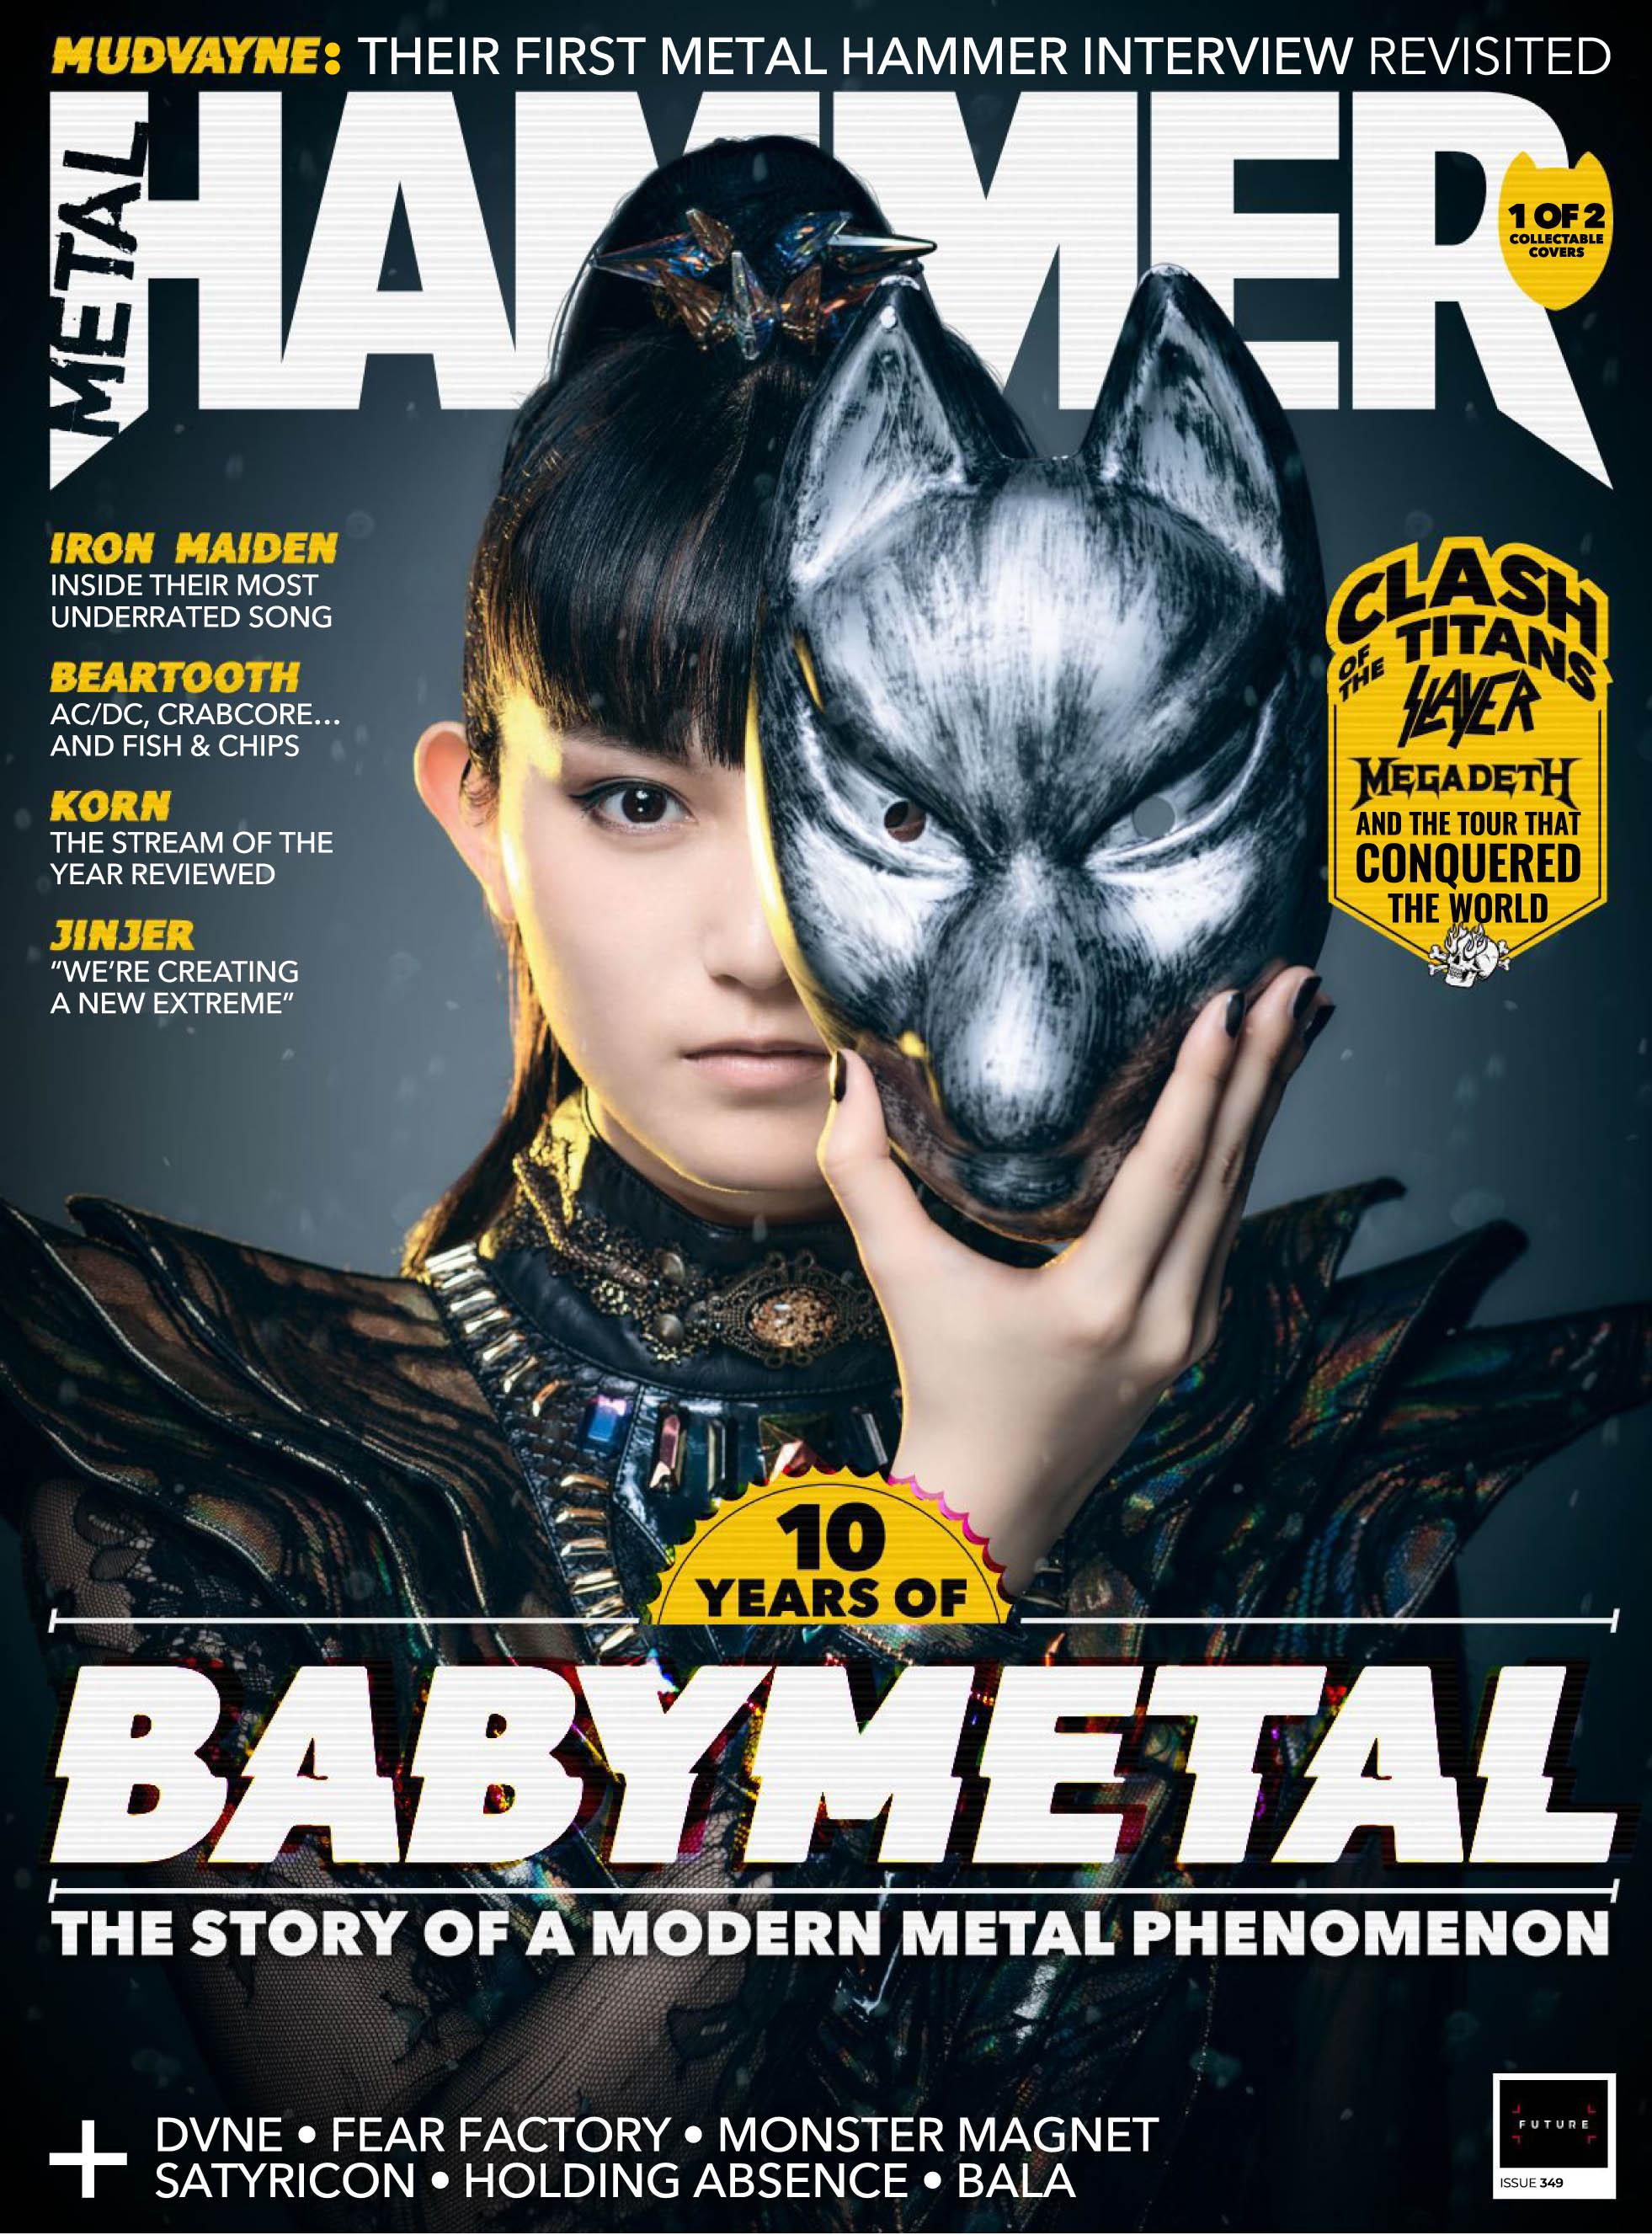 Metal Hammer UK 2021-07 Babymetal 01.jpg